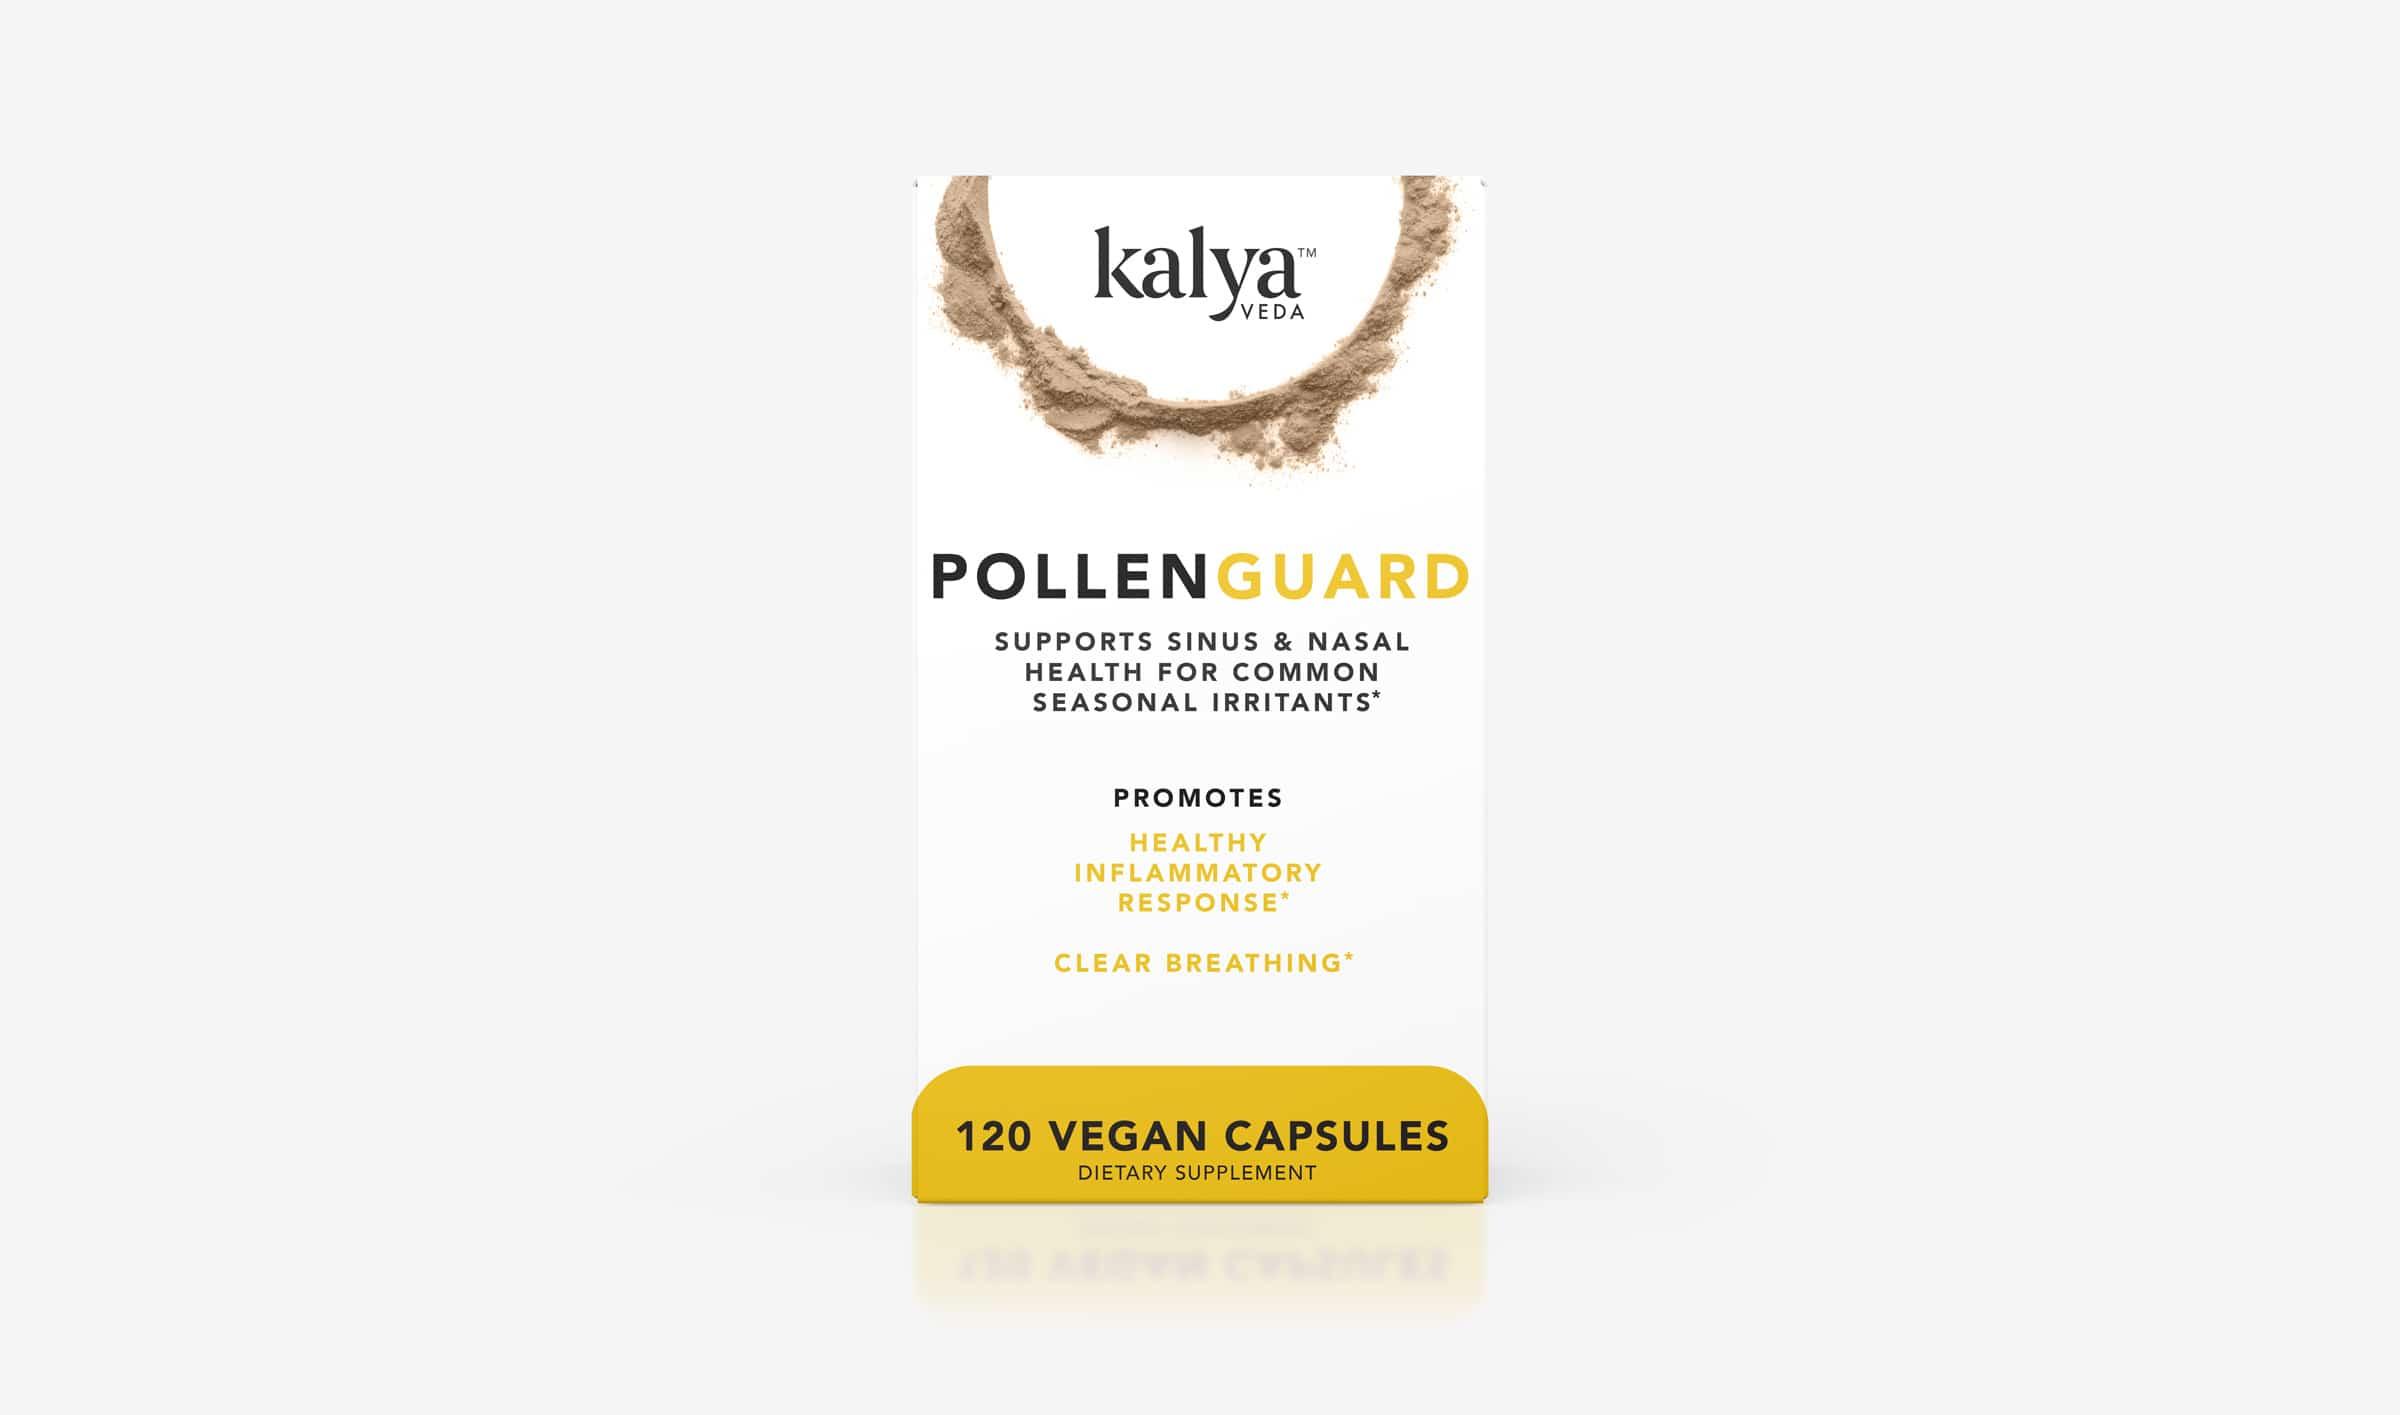 PollenGuard-Box-2400x1415